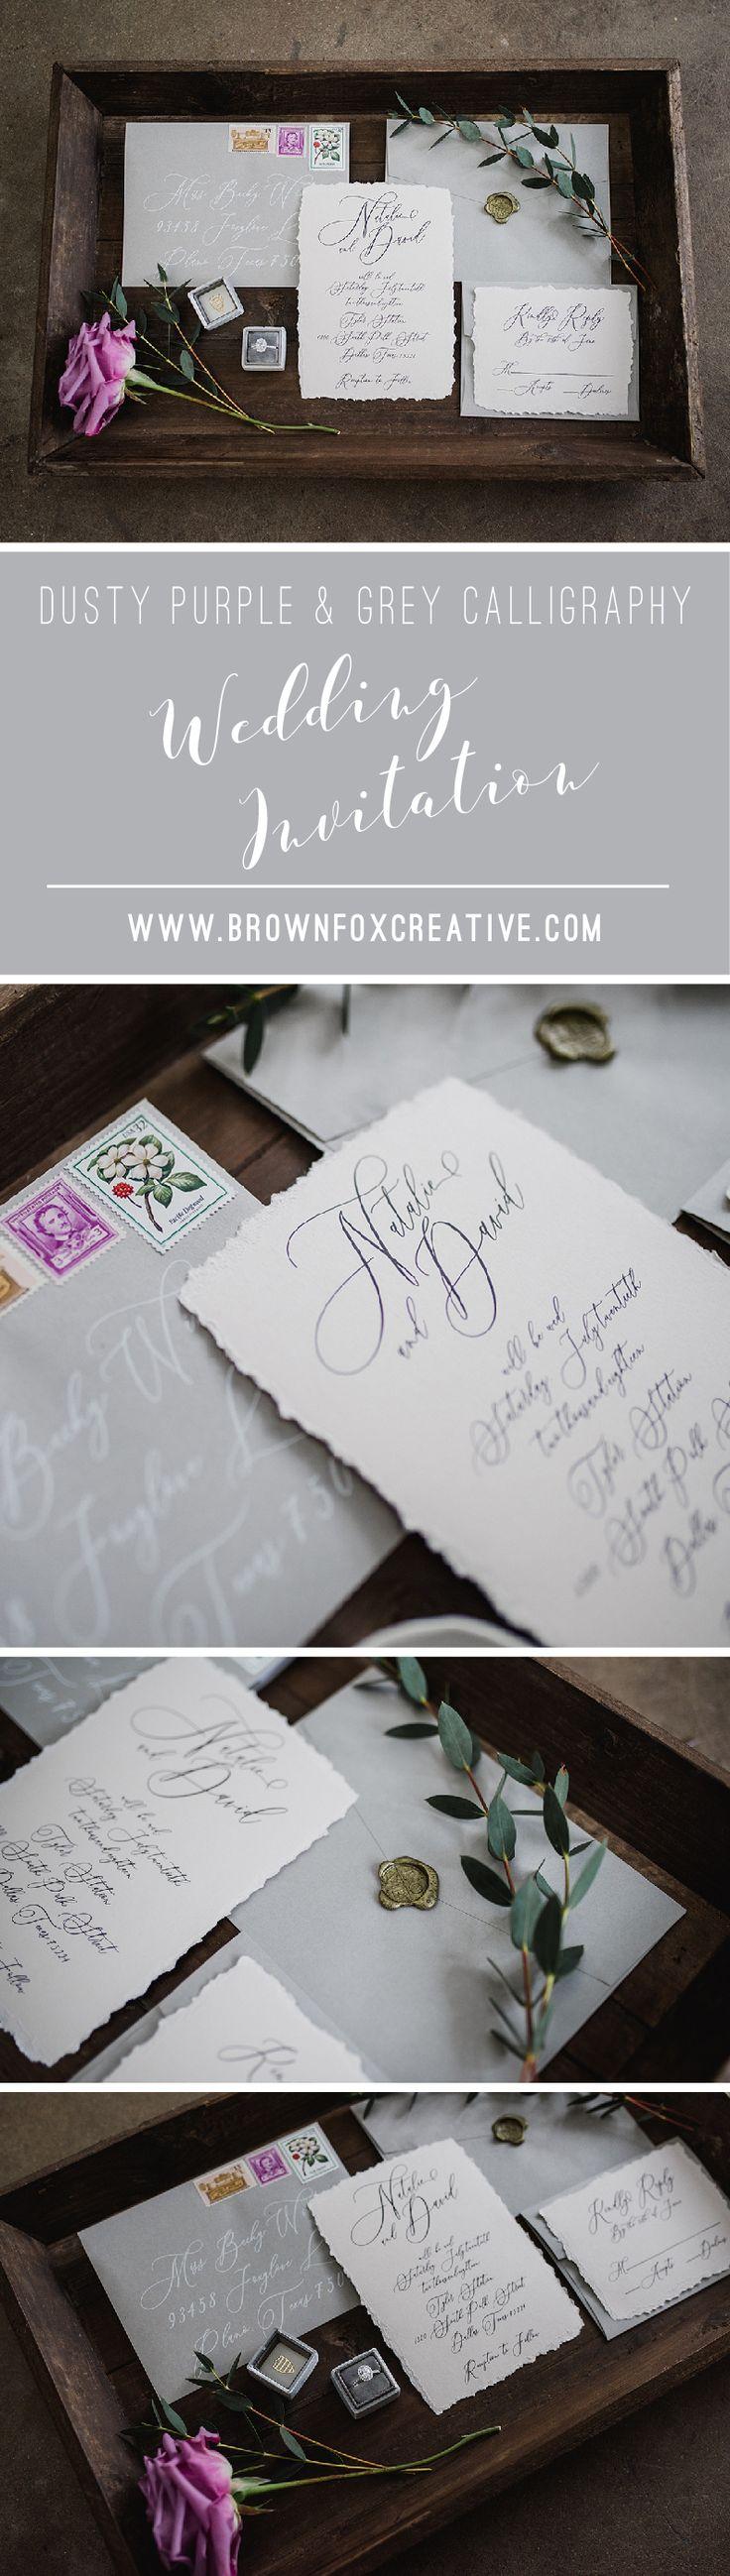 addressing wedding invitations married woman doctor%0A Dusty Purple  u     Grey Script Modern Calligraphy Wedding Invitation  u     Envelope  Liner  RSVP  and